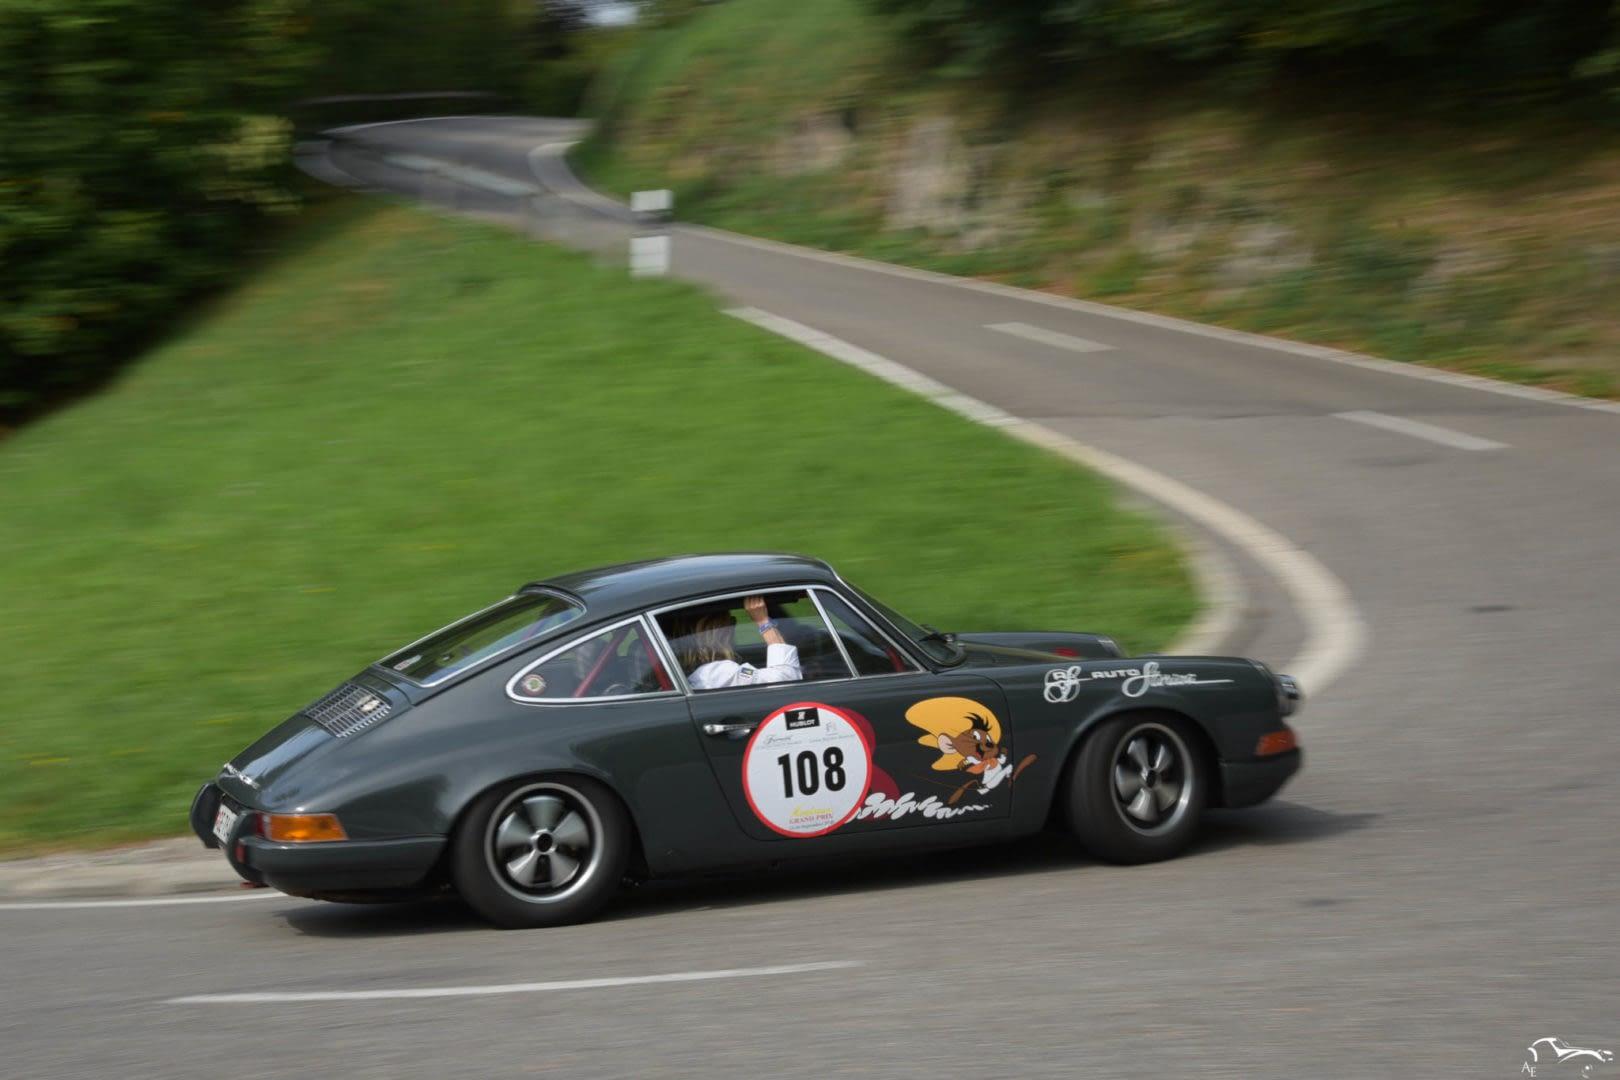 Porsche JSO 2.4 S (ex Almeras)